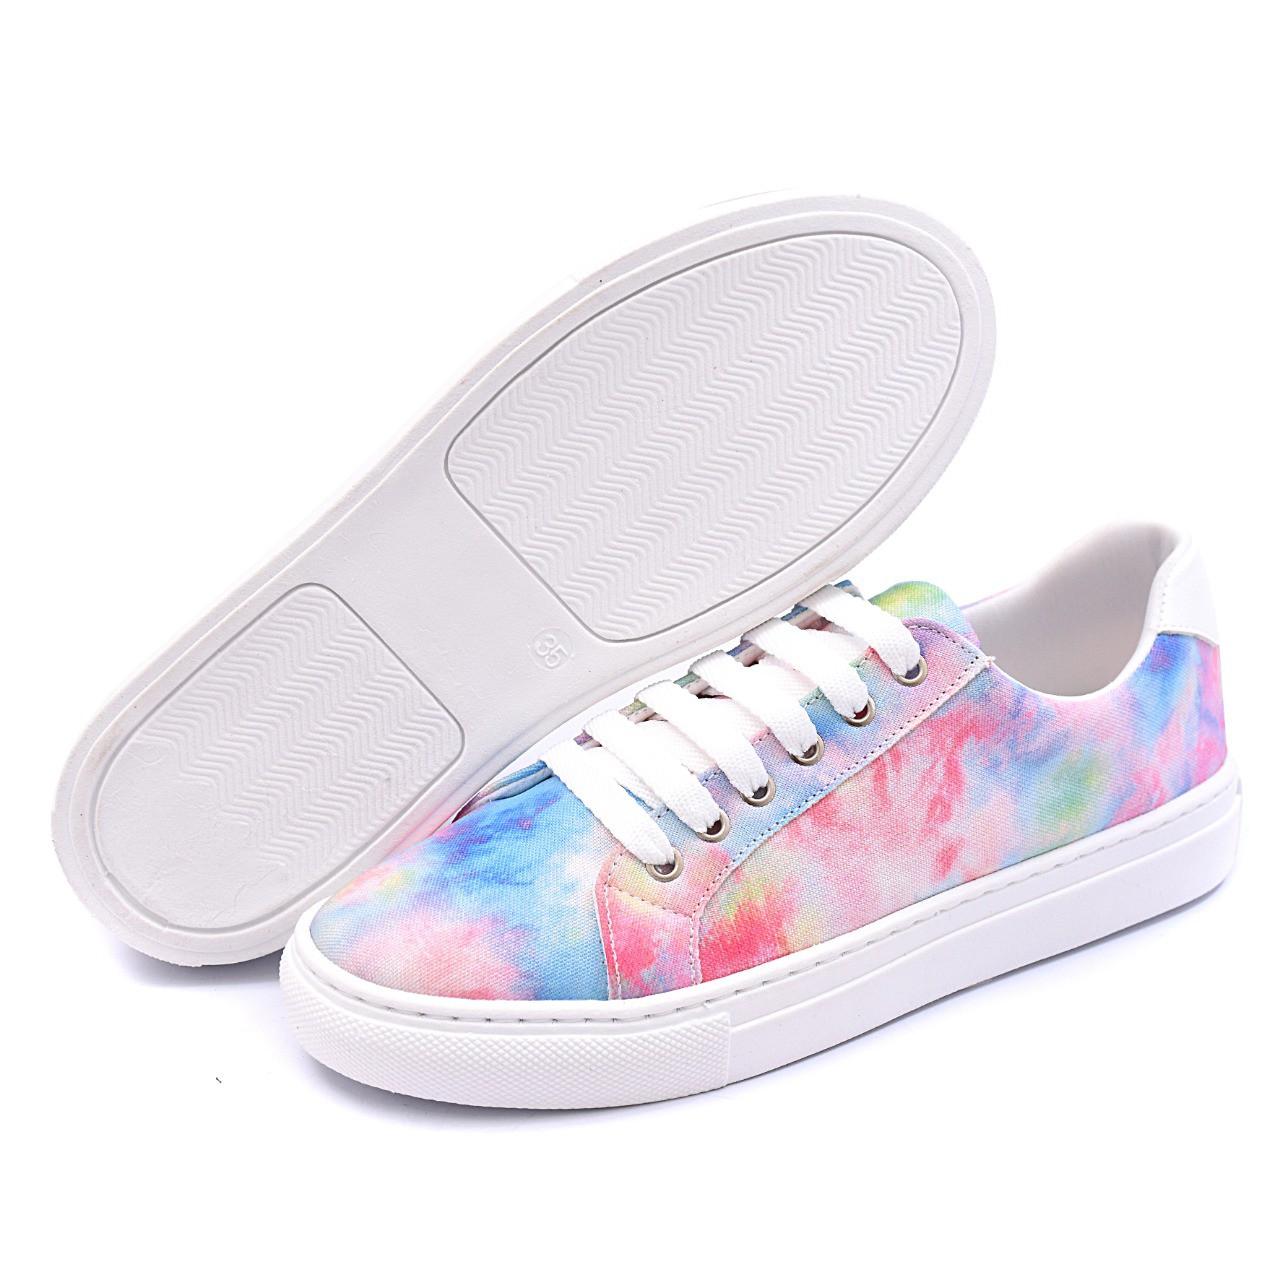 Tênis Colorido Gommix Shoes 085 Tie Dye Sola Baixa